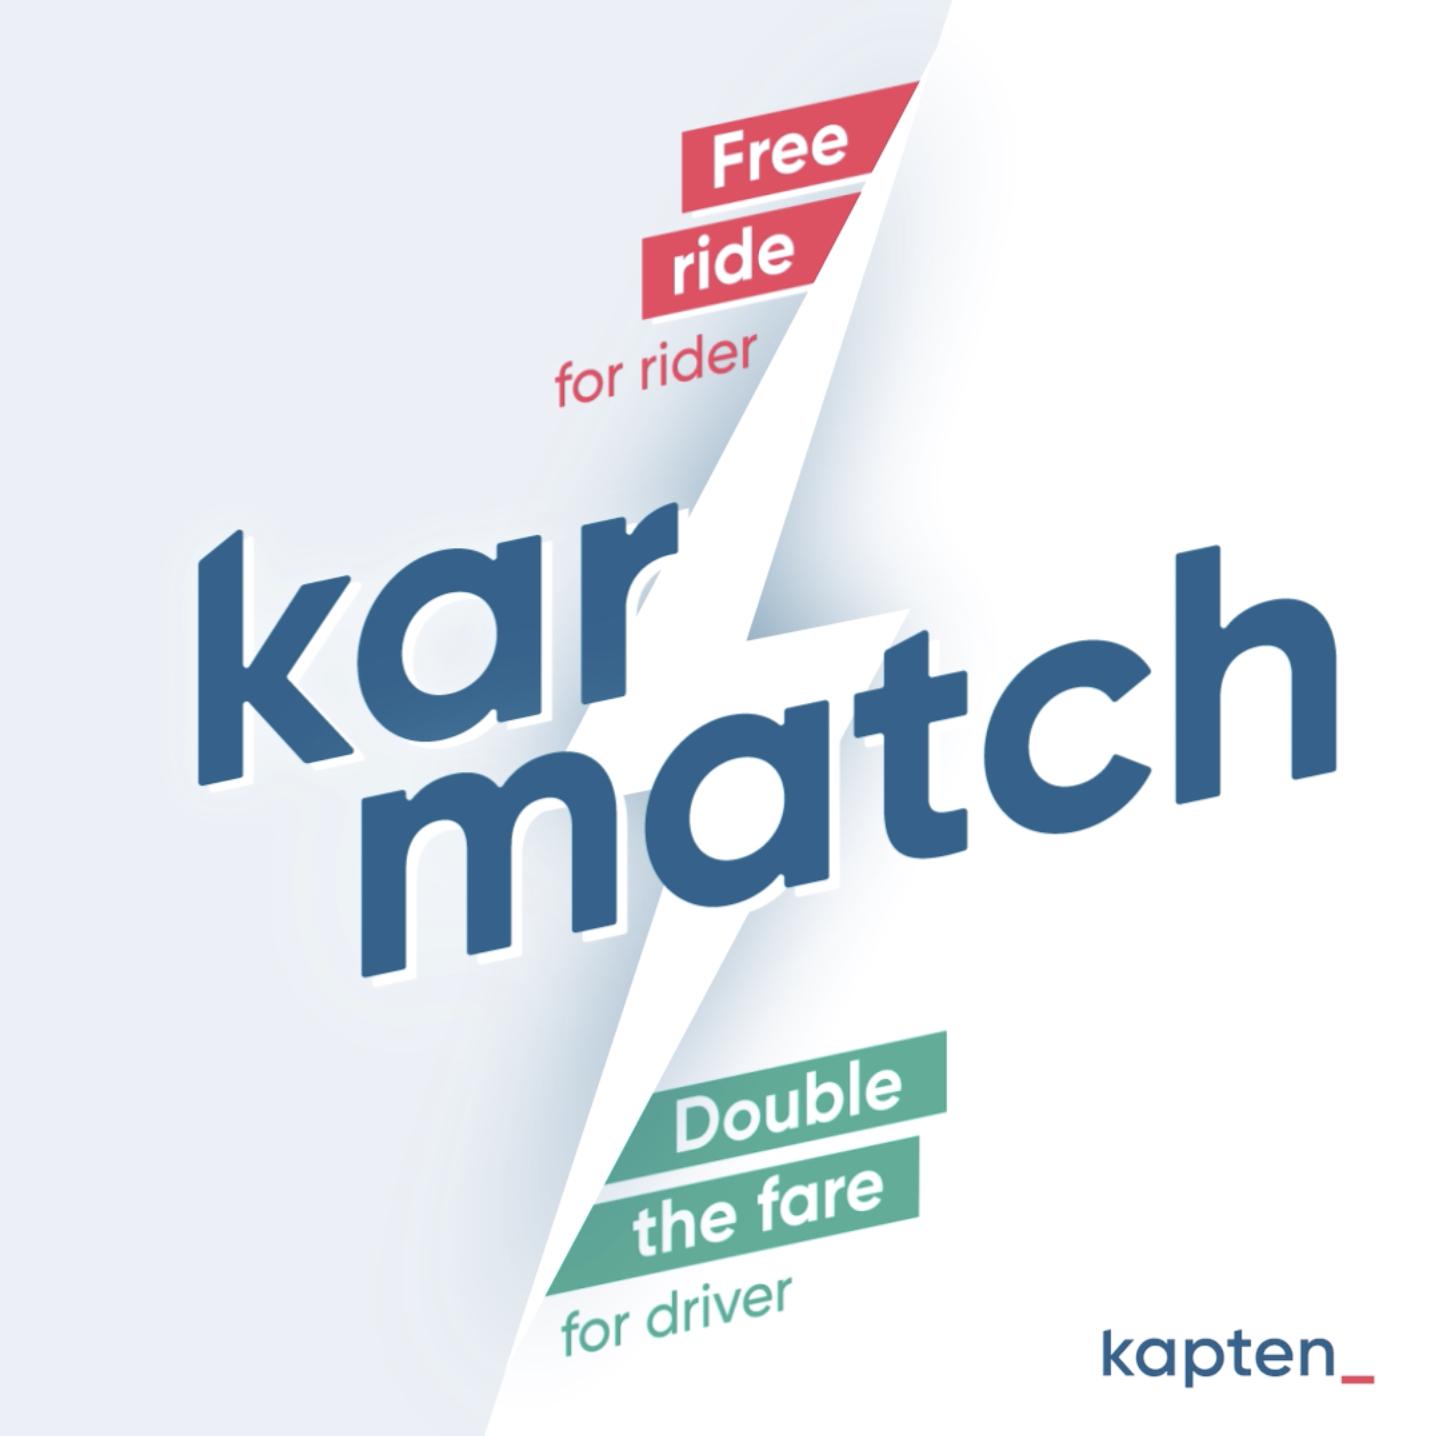 Recipe Wins Lead Digital and Social Agency for Ride-Hailing App Kapten